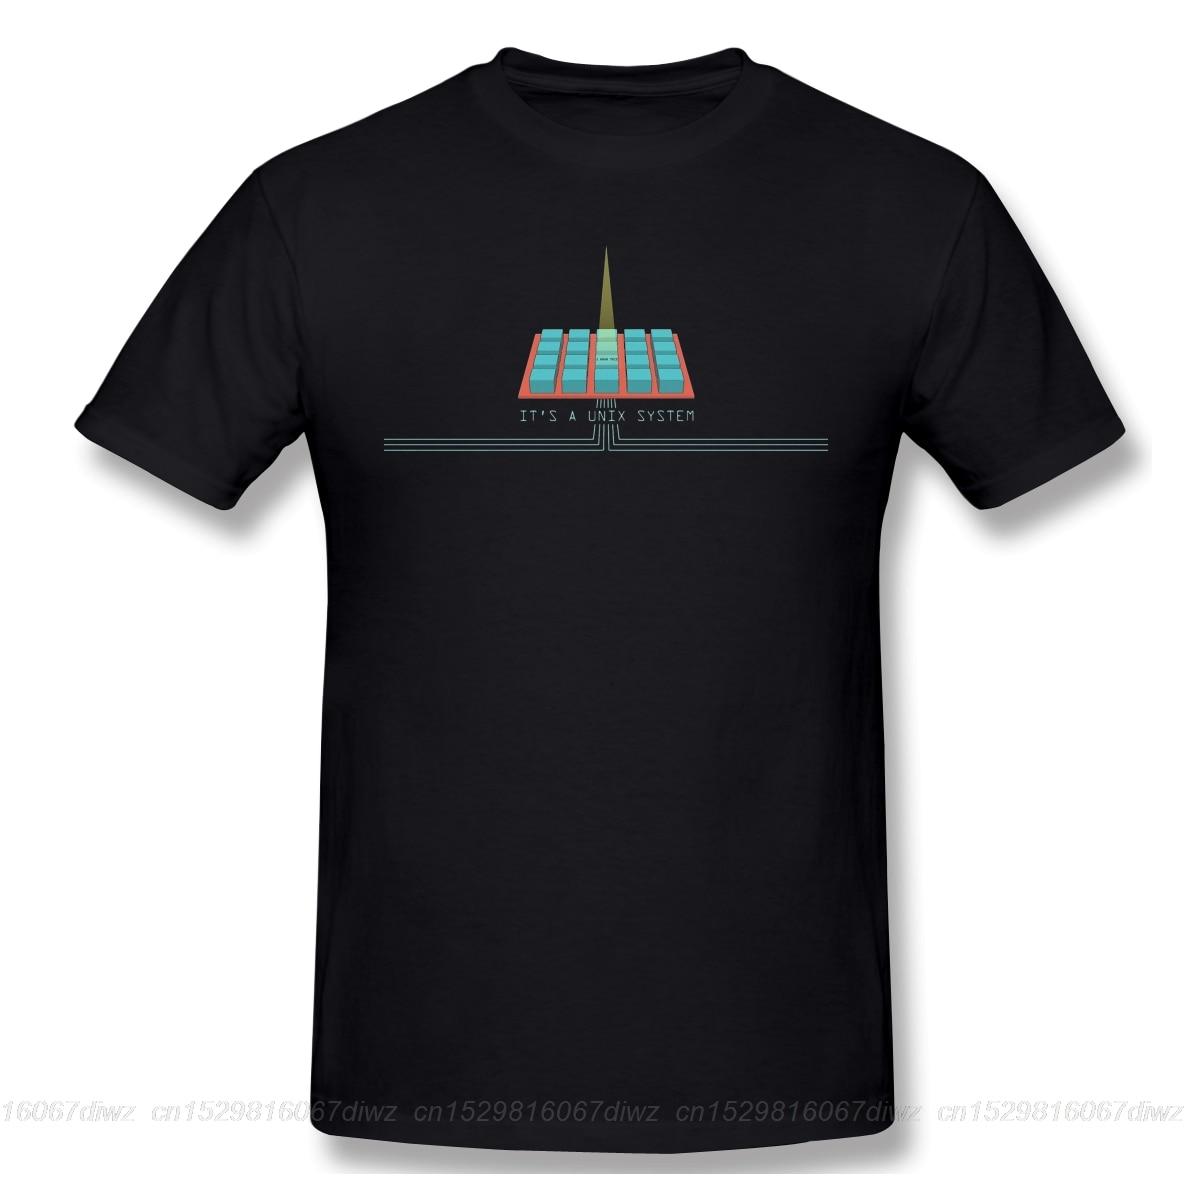 linux Computer operating system Geek T Shirt Red T-Shirt 6xl Cute Tee Shirt Graphic Jurassic Park Unix System Tshirt